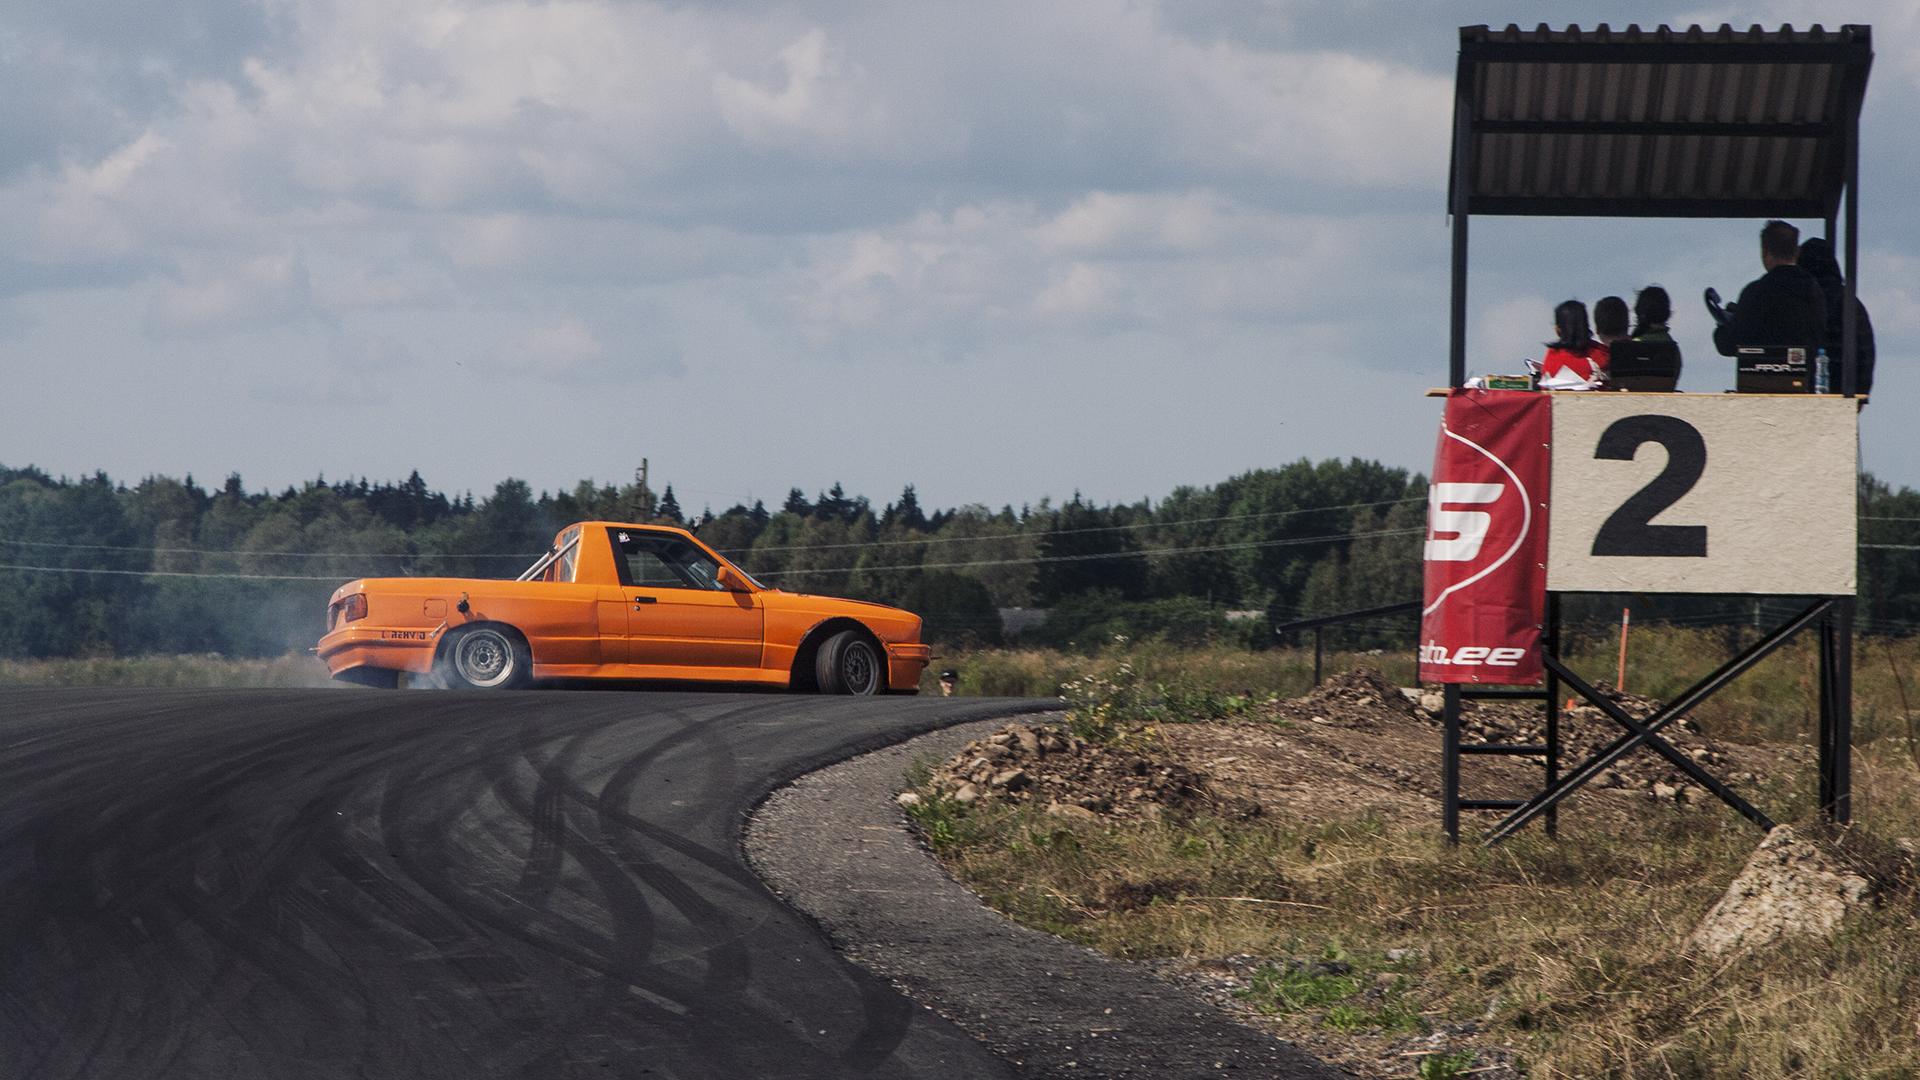 10-years-of-drifting-in-estonia-2012-by-wheelsbywovka-1